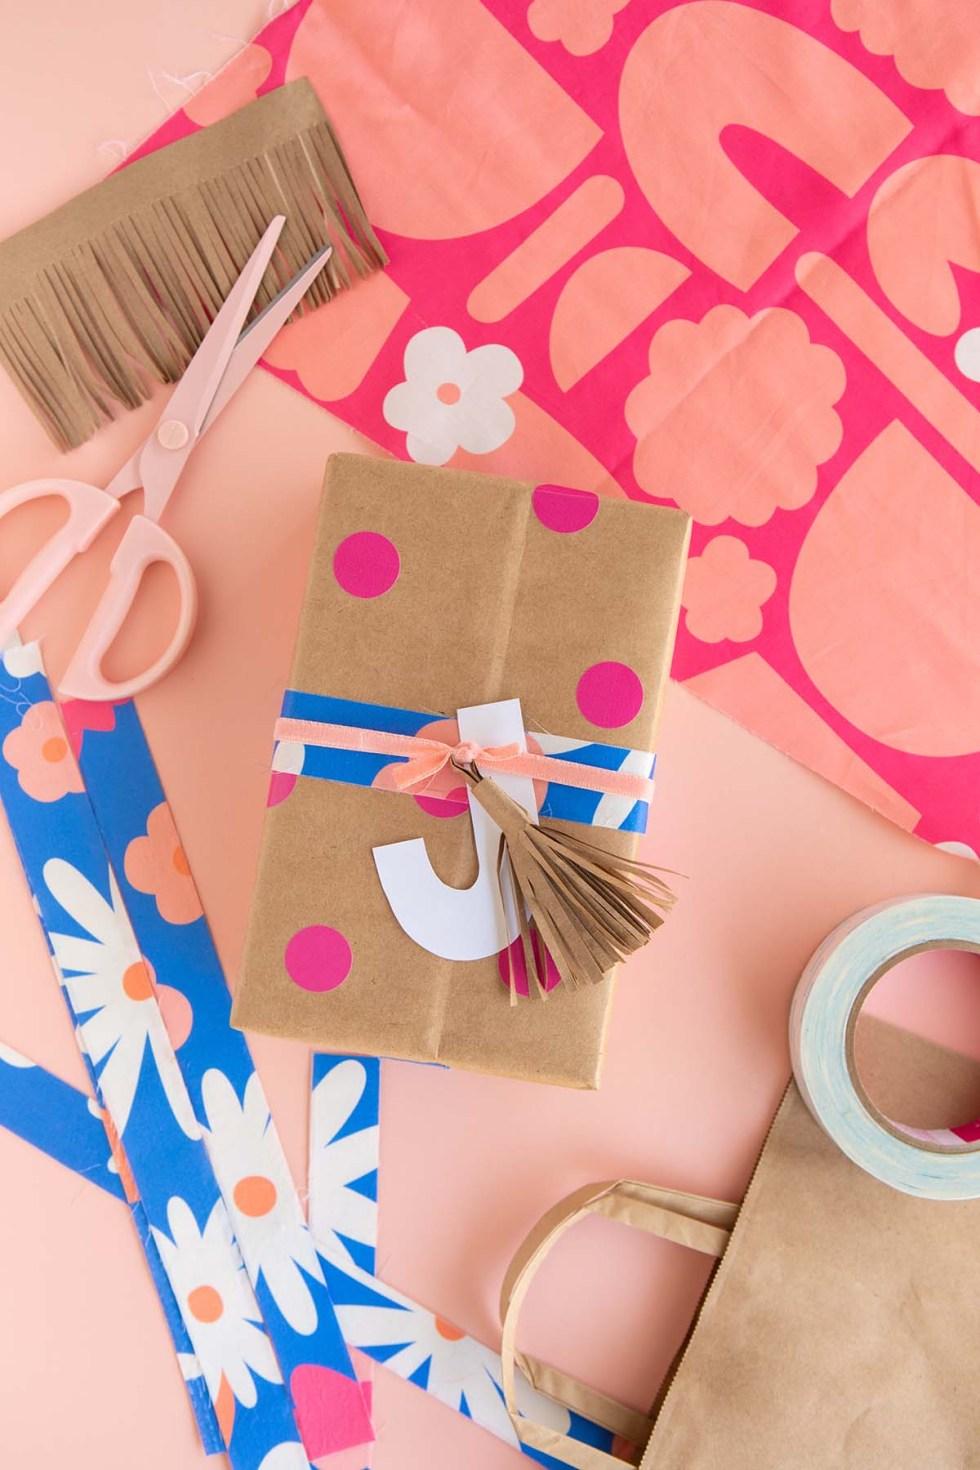 DIY Gift Wrap Ideas - Fabric Scraps into Tape